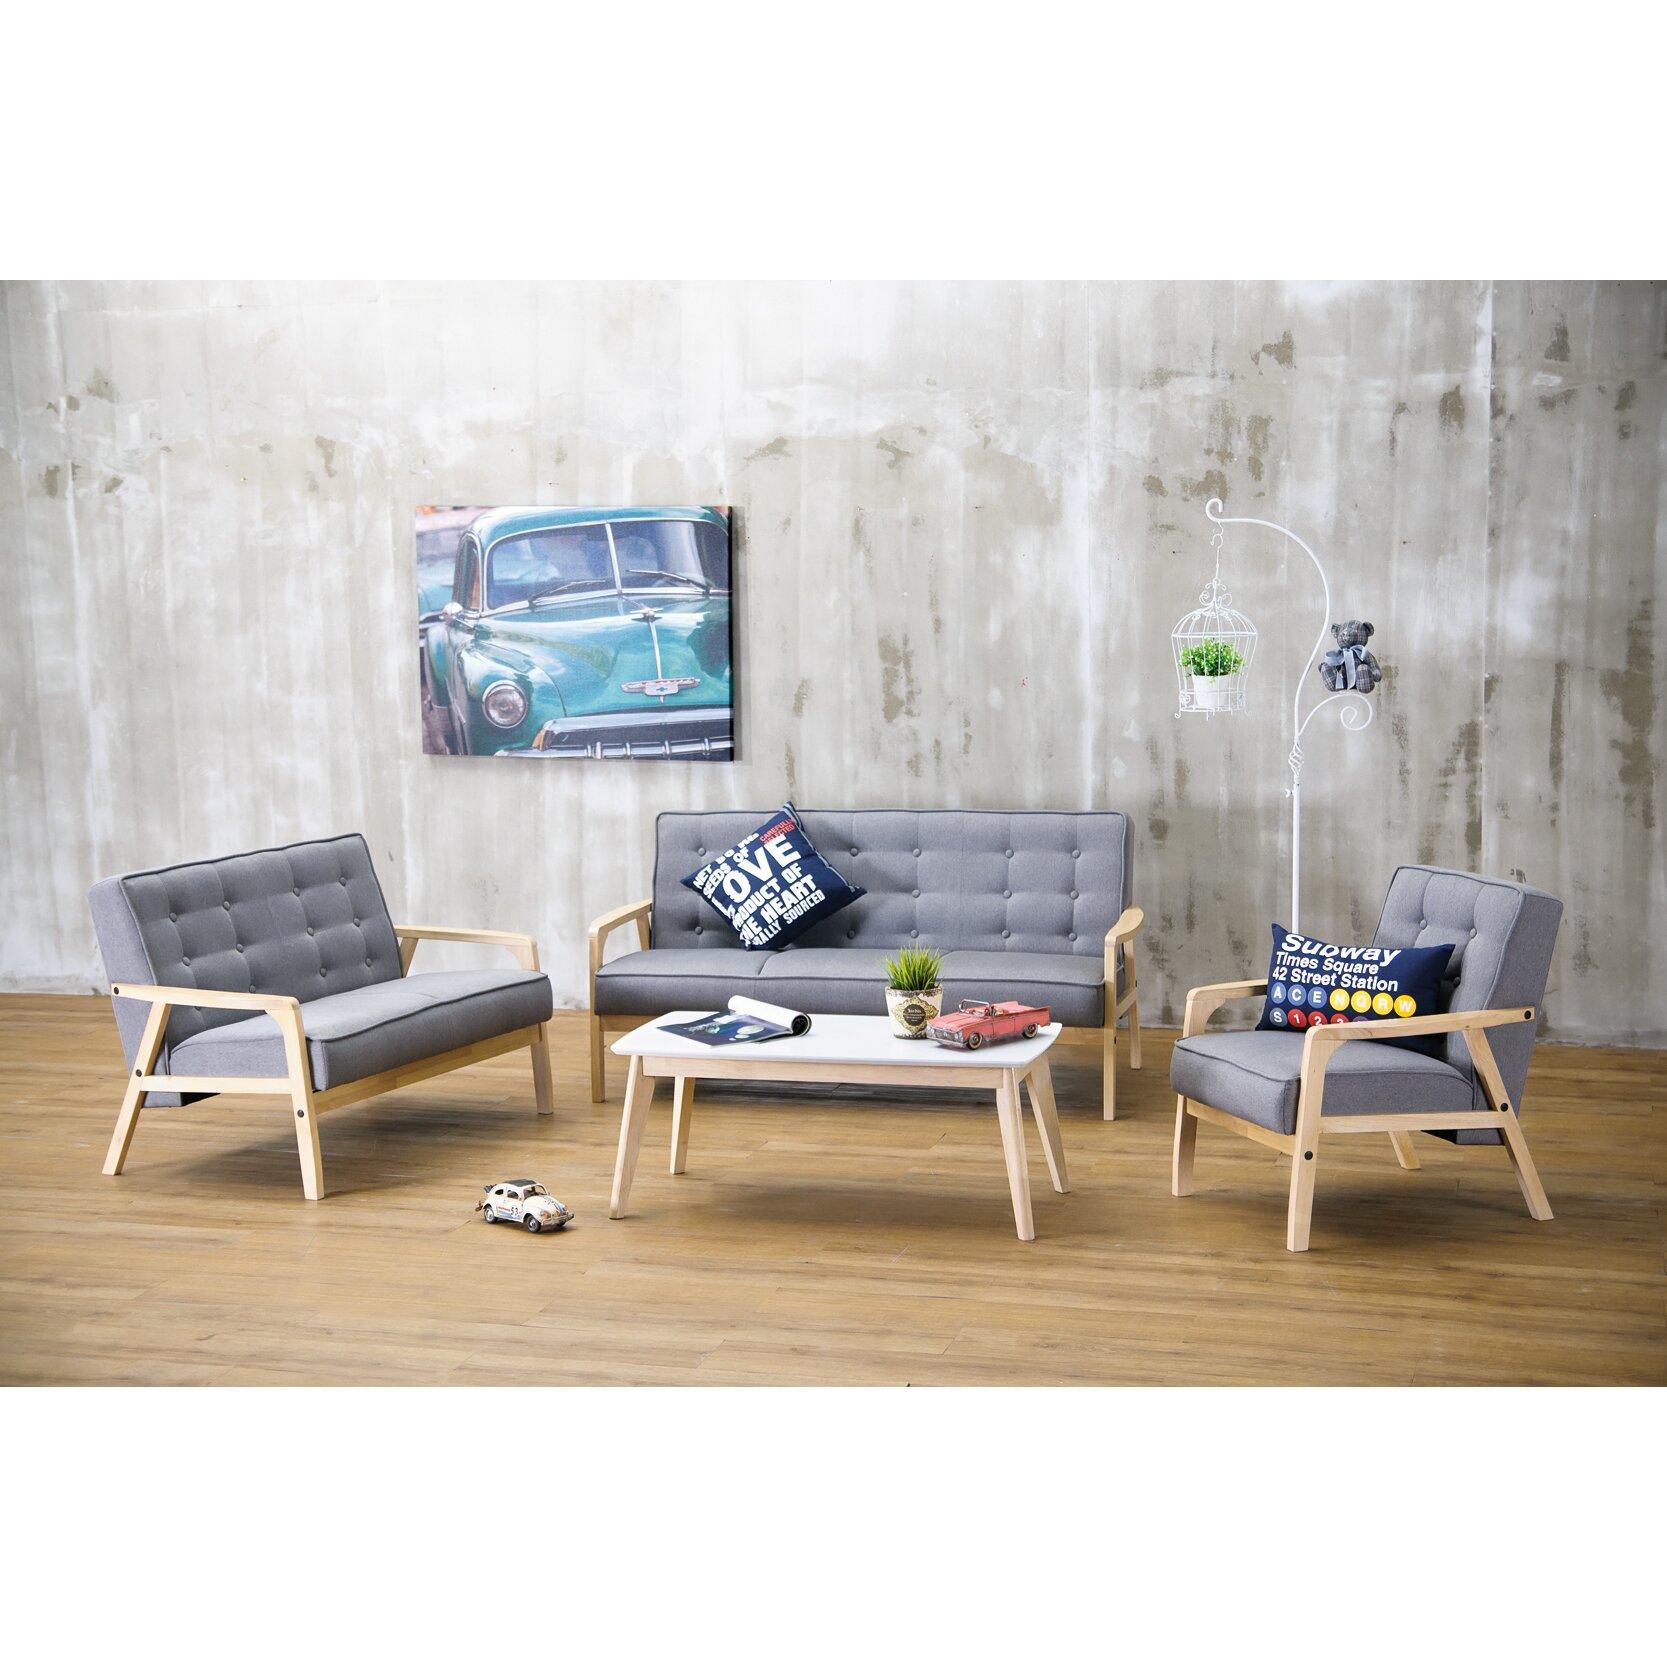 Baxton Studio Mid Century Masterpieces White Faux Leather: Wholesale Interiors Baxton Studio Mid Century Timor Arm